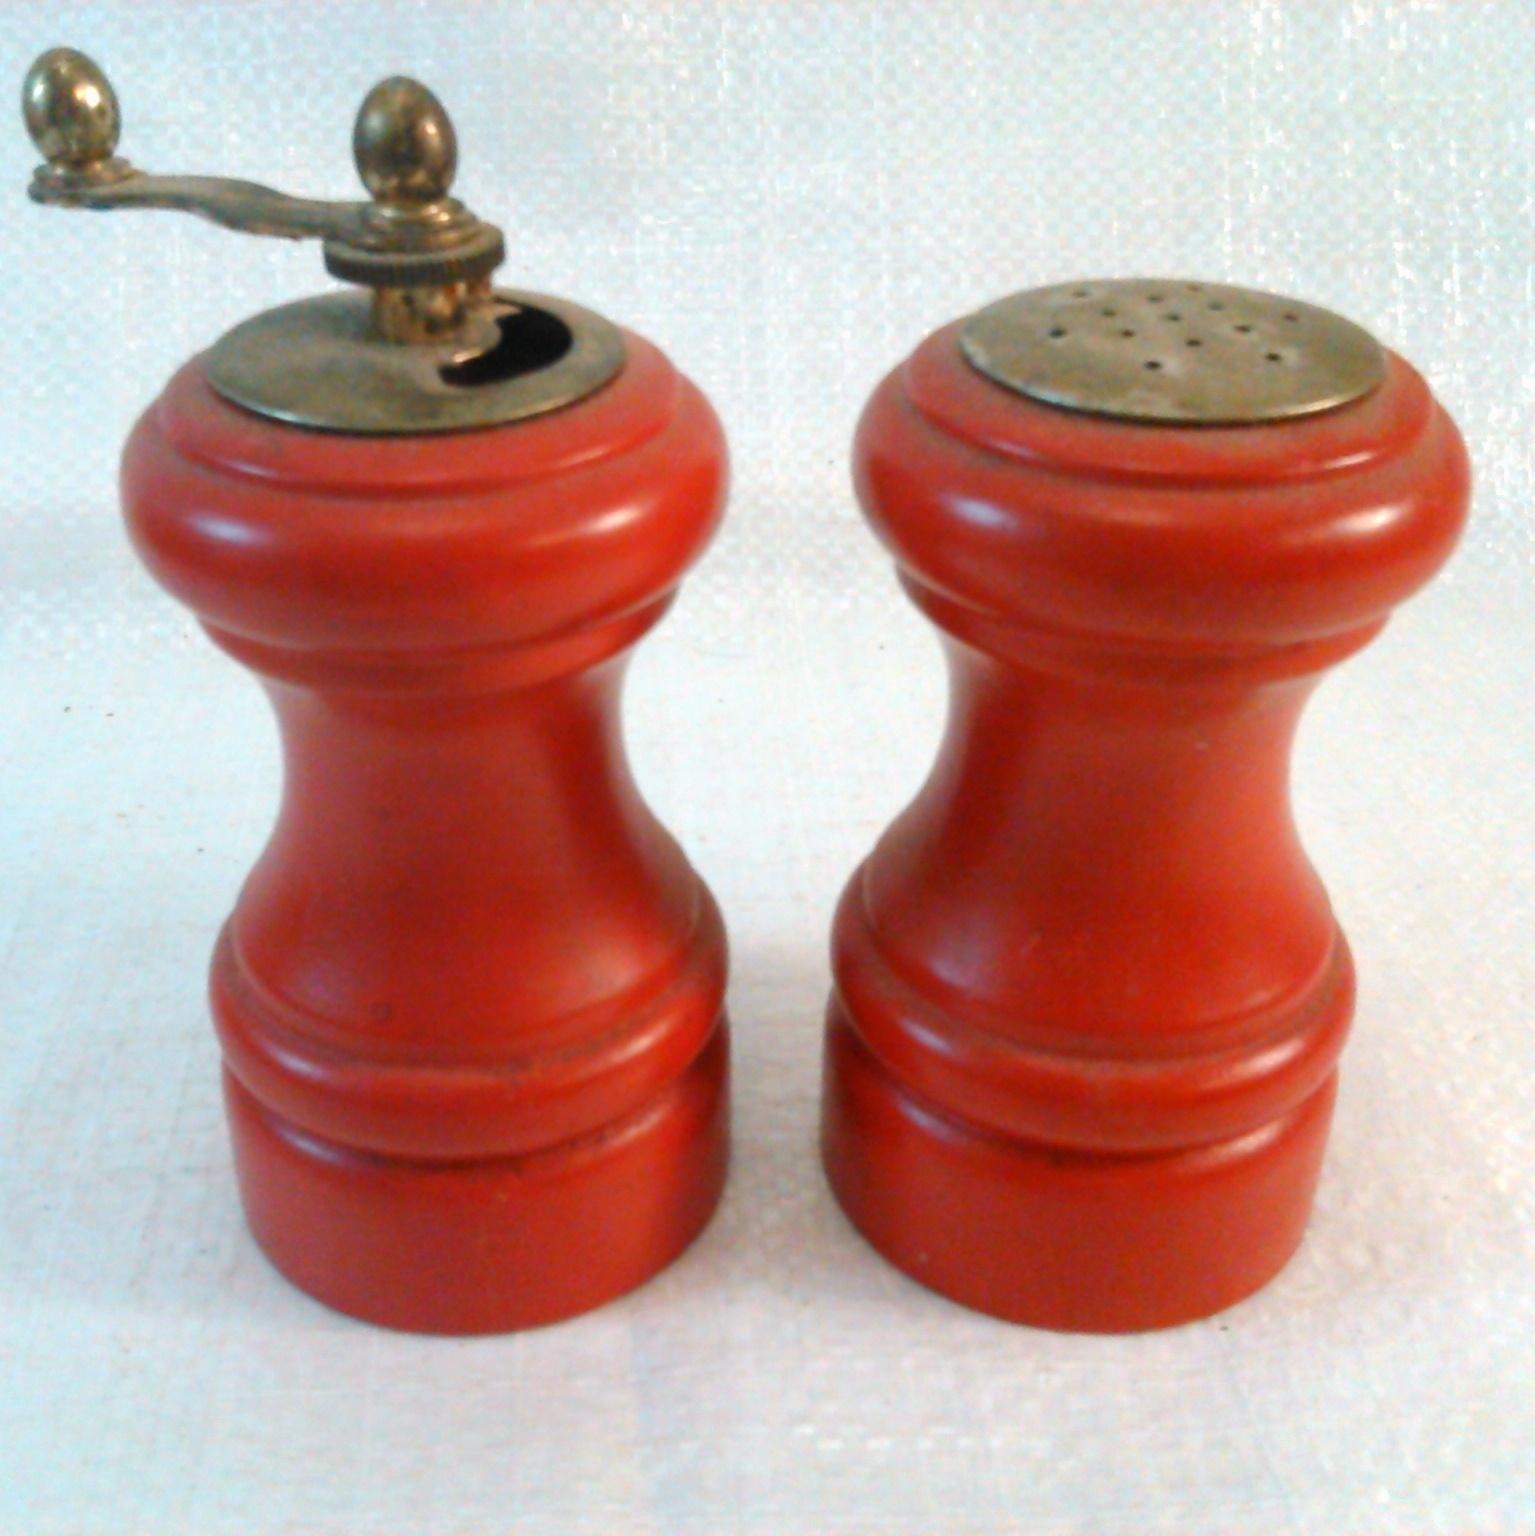 Vintage Wooden Salt Shaker and Pepper Mill Red